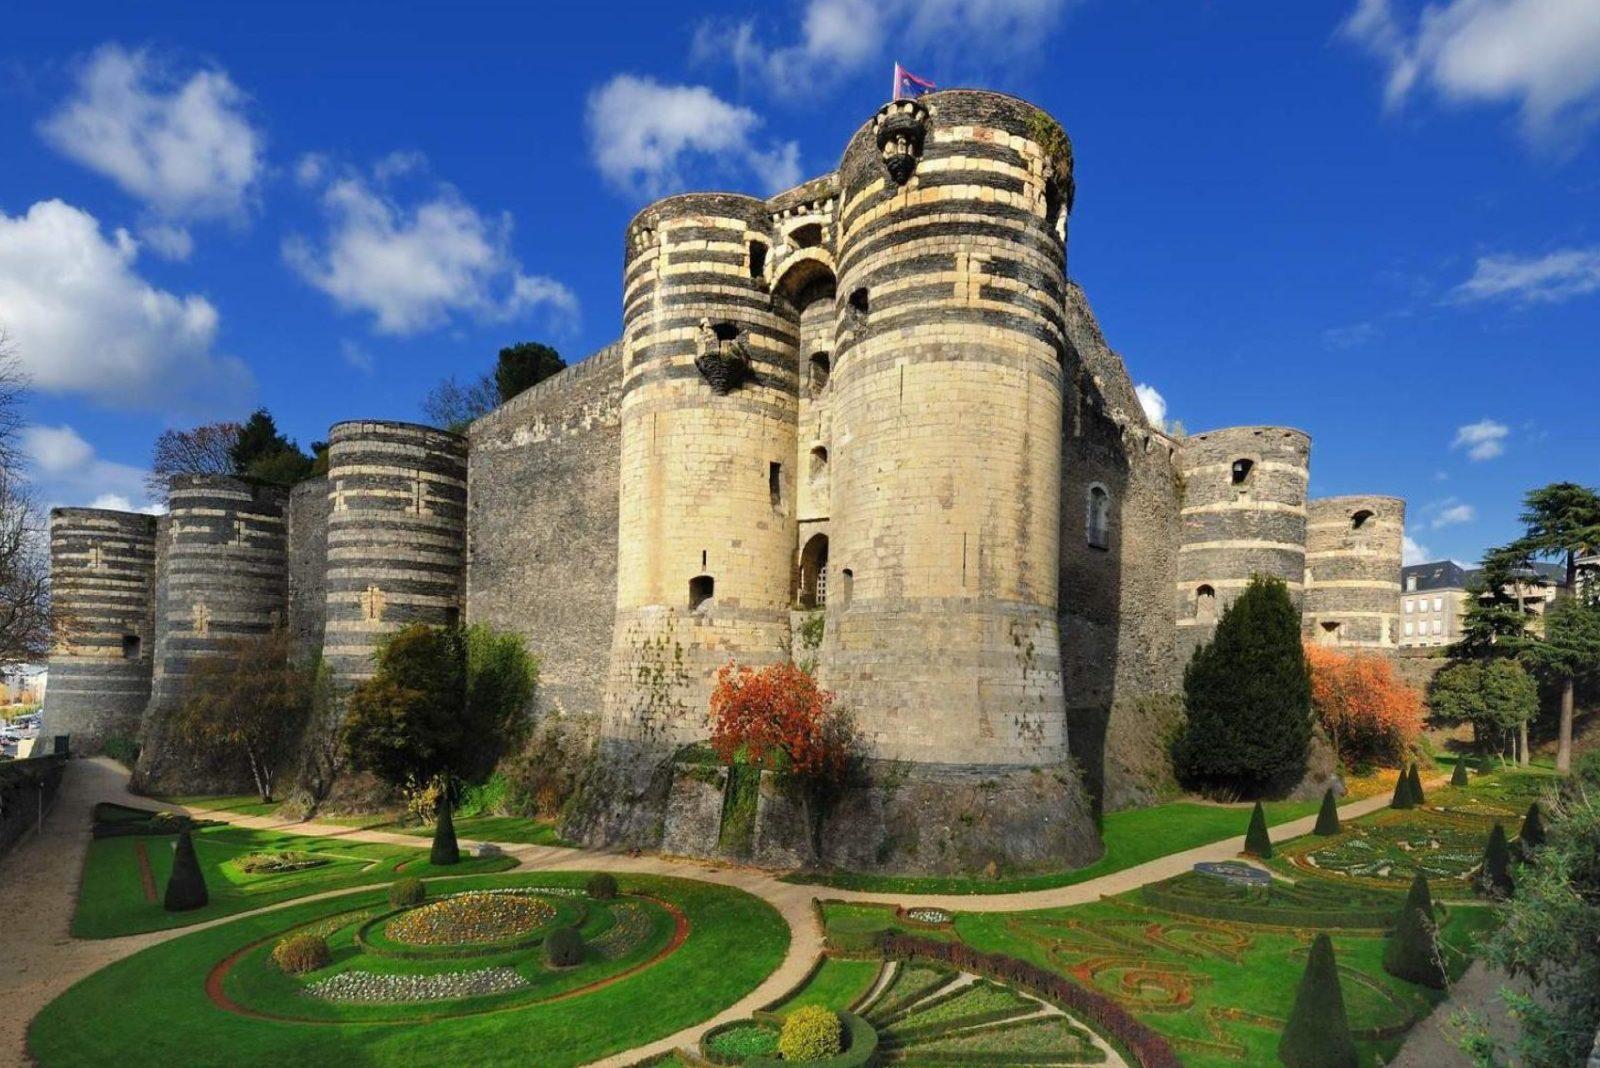 Анжерский замок (Château d'Angers)